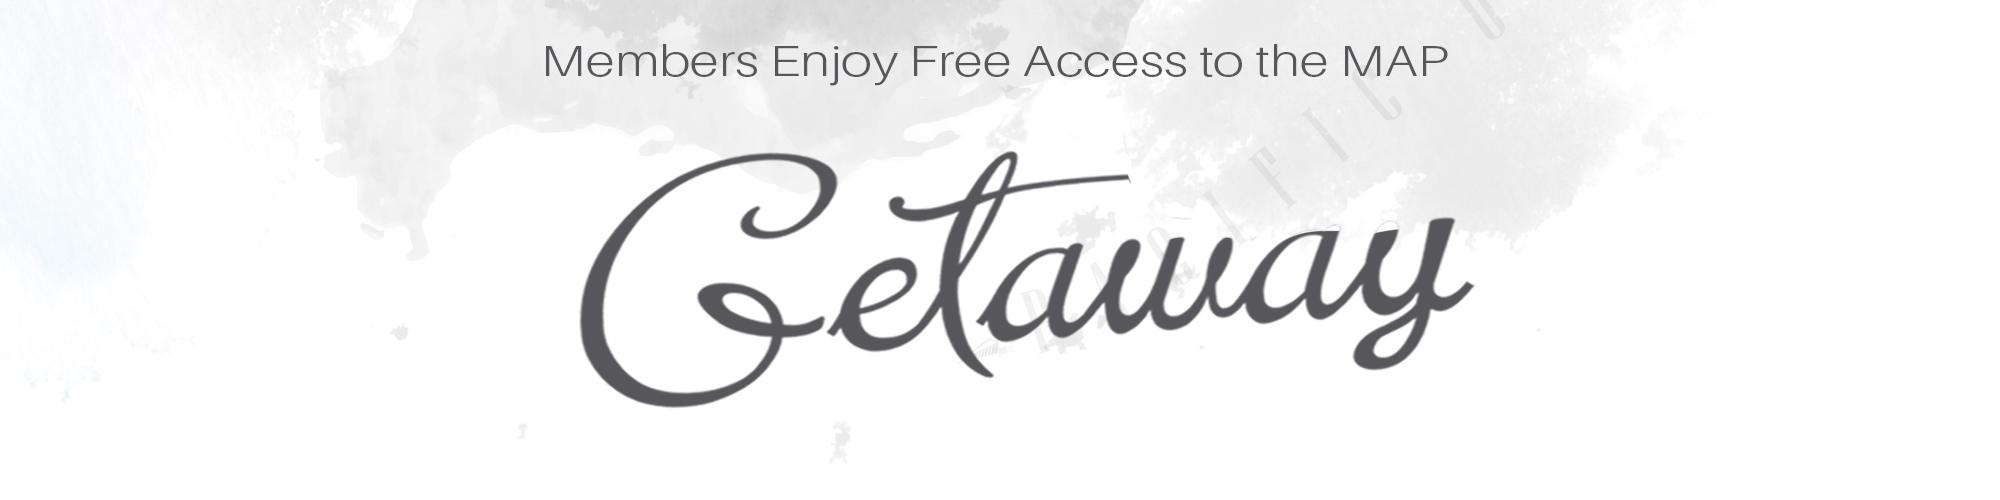 free-access